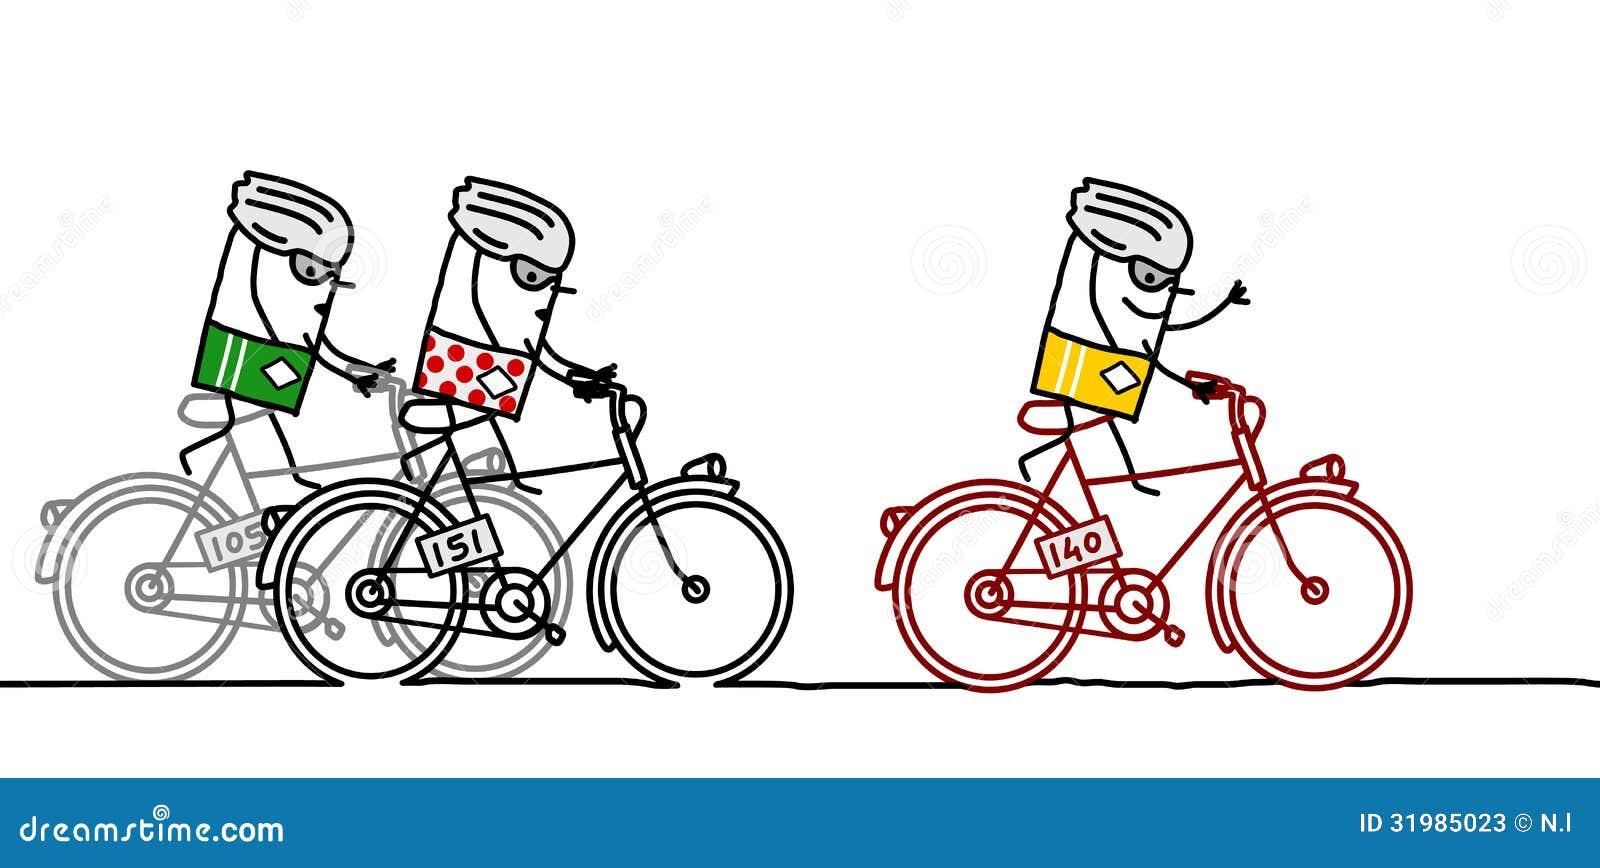 Cyclists Amp Tour De France Stock Vector Illustration Of